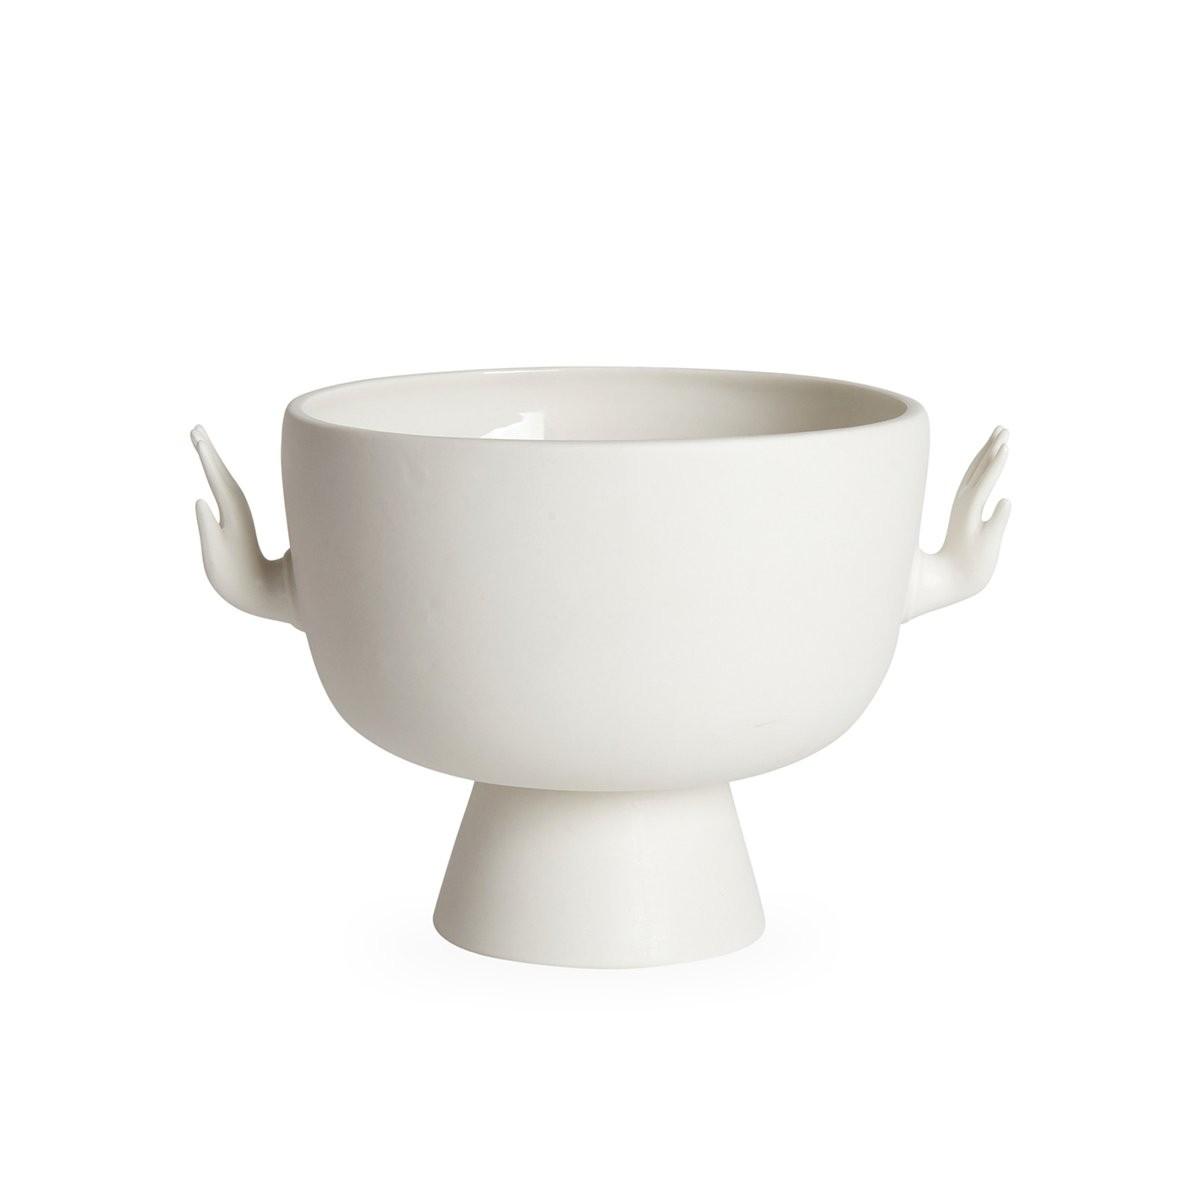 Jonathan Adler I Eve Pedestal Bowl